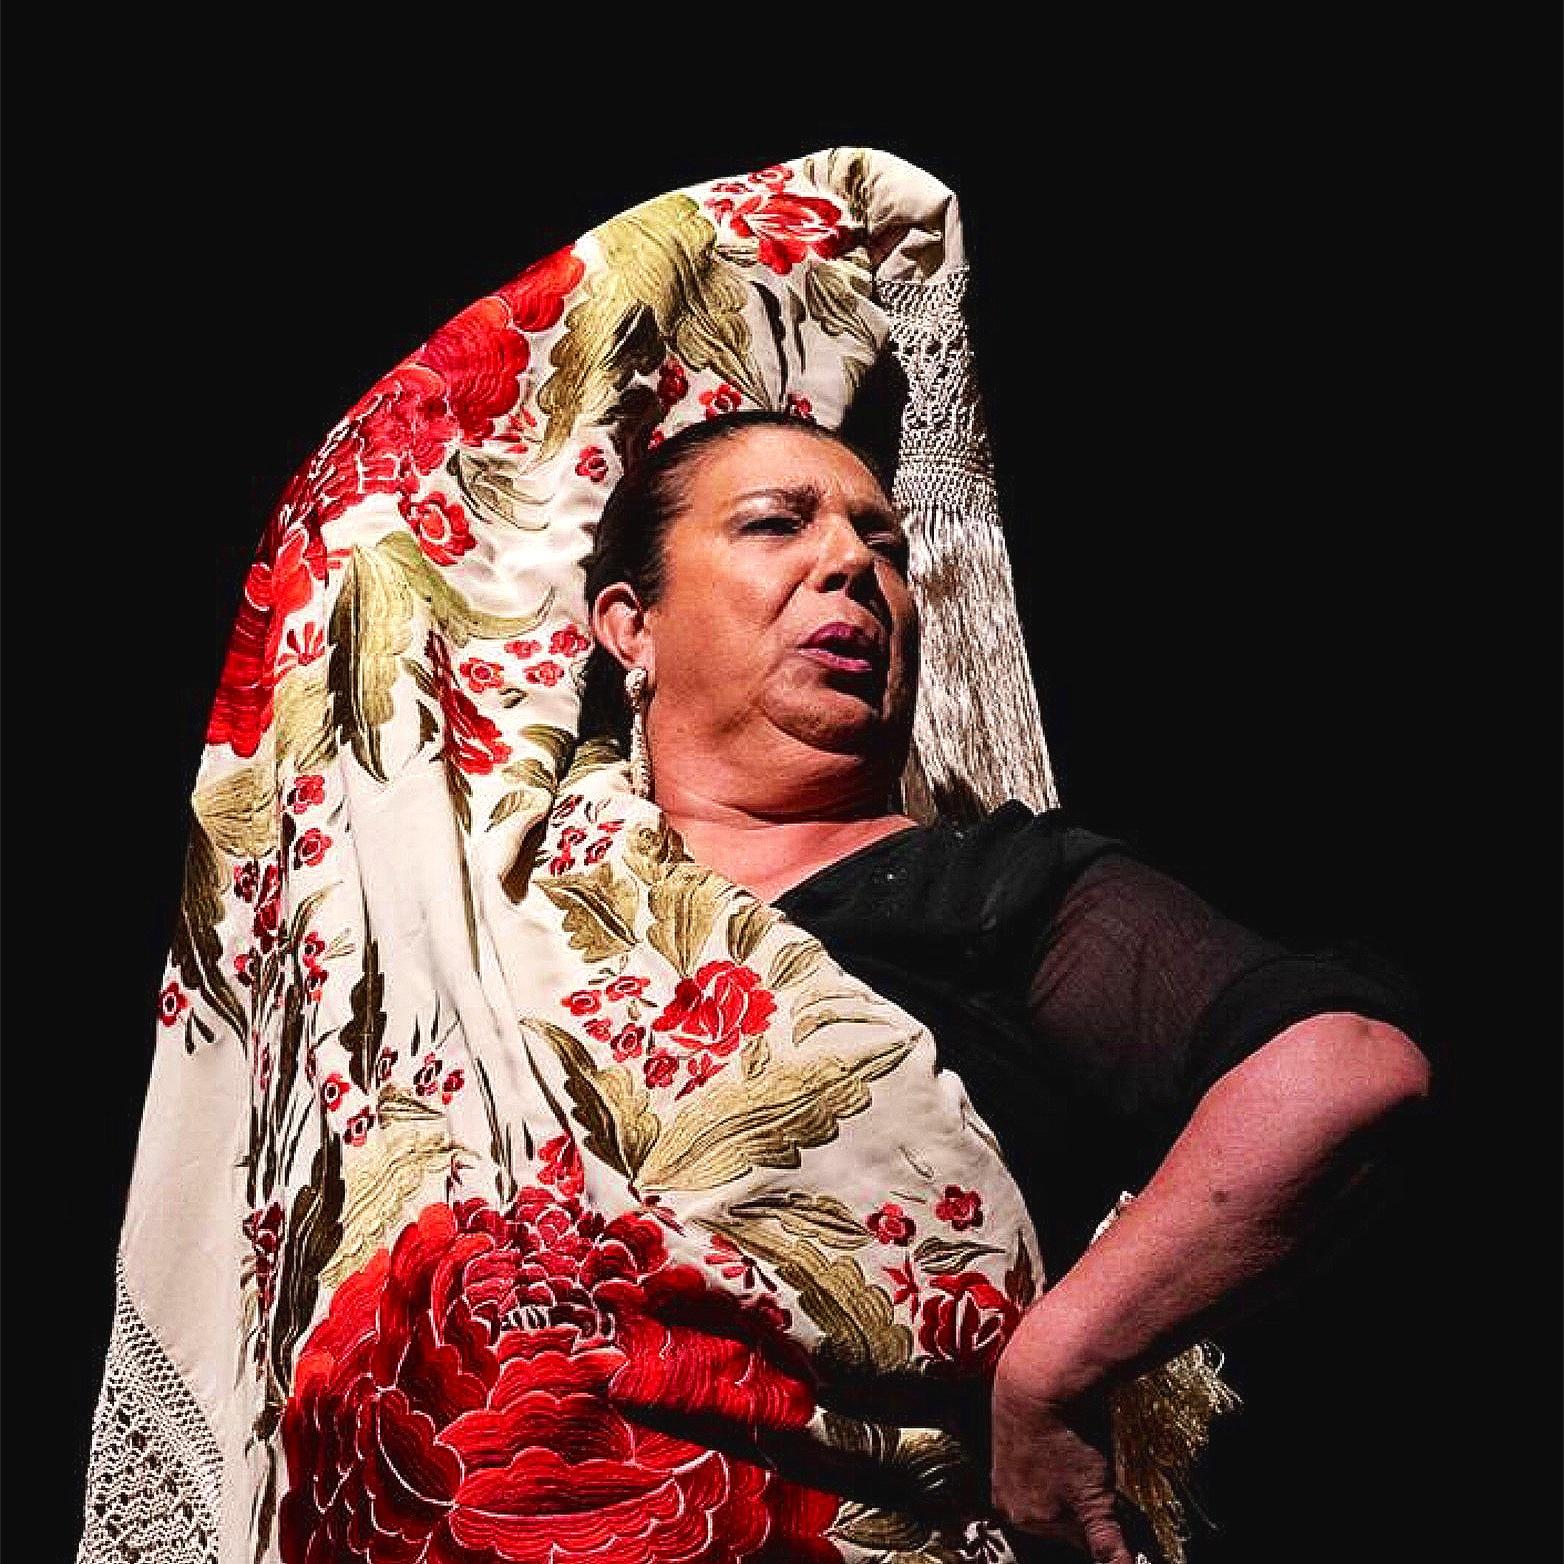 Carmen Ledesma - Bailar el Cante